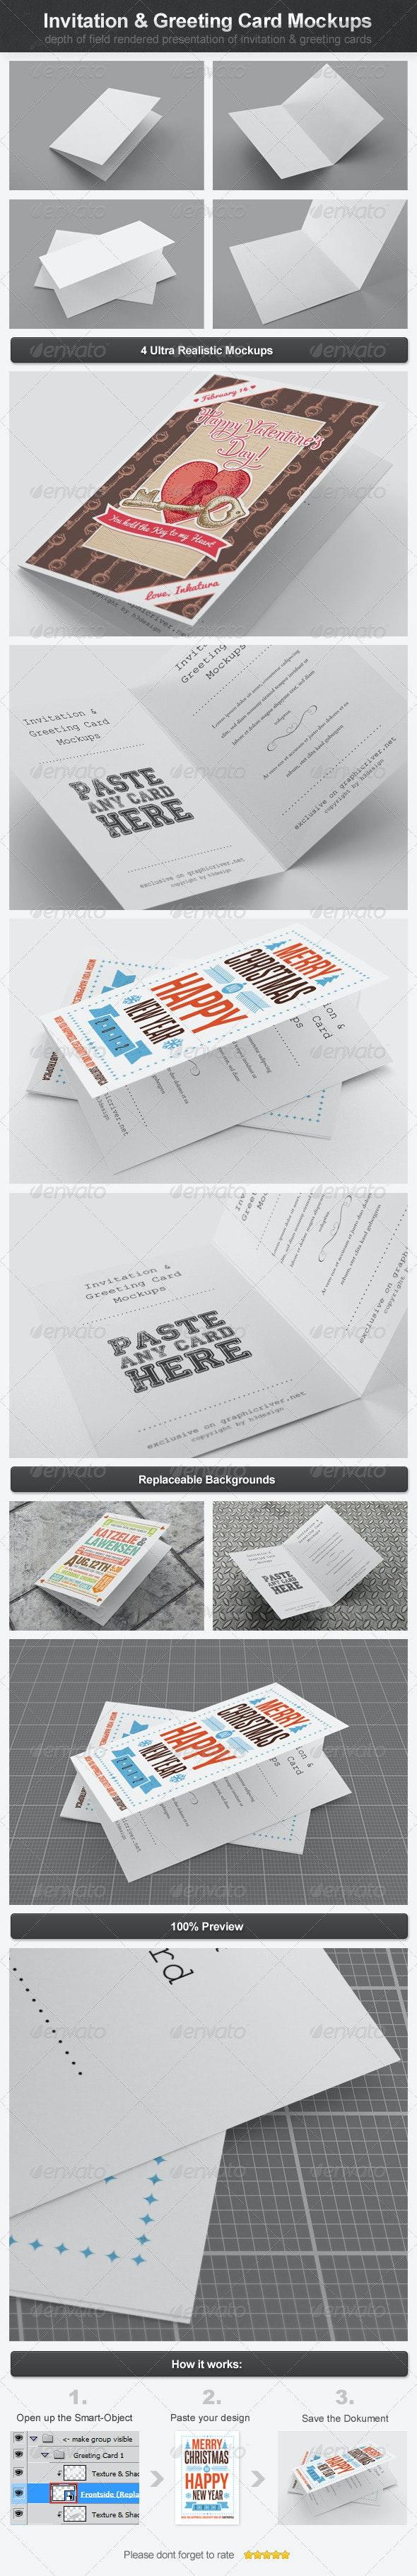 Invitation & Greeting Card Mockups - Miscellaneous Print